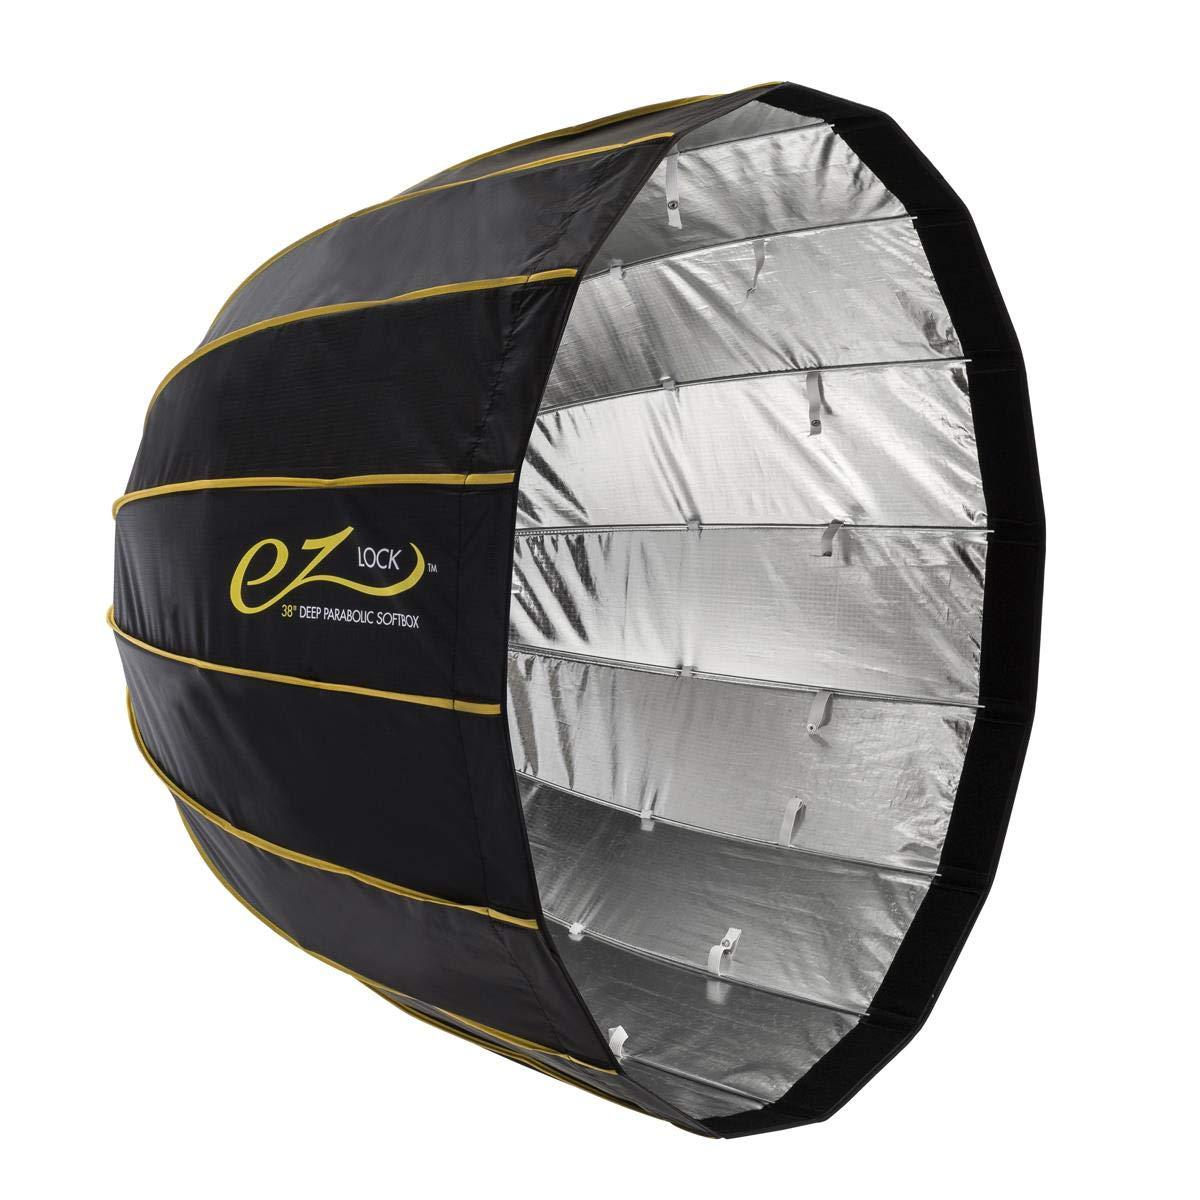 28 Glow EZ Lock Deep Parabolic Quick Softbox